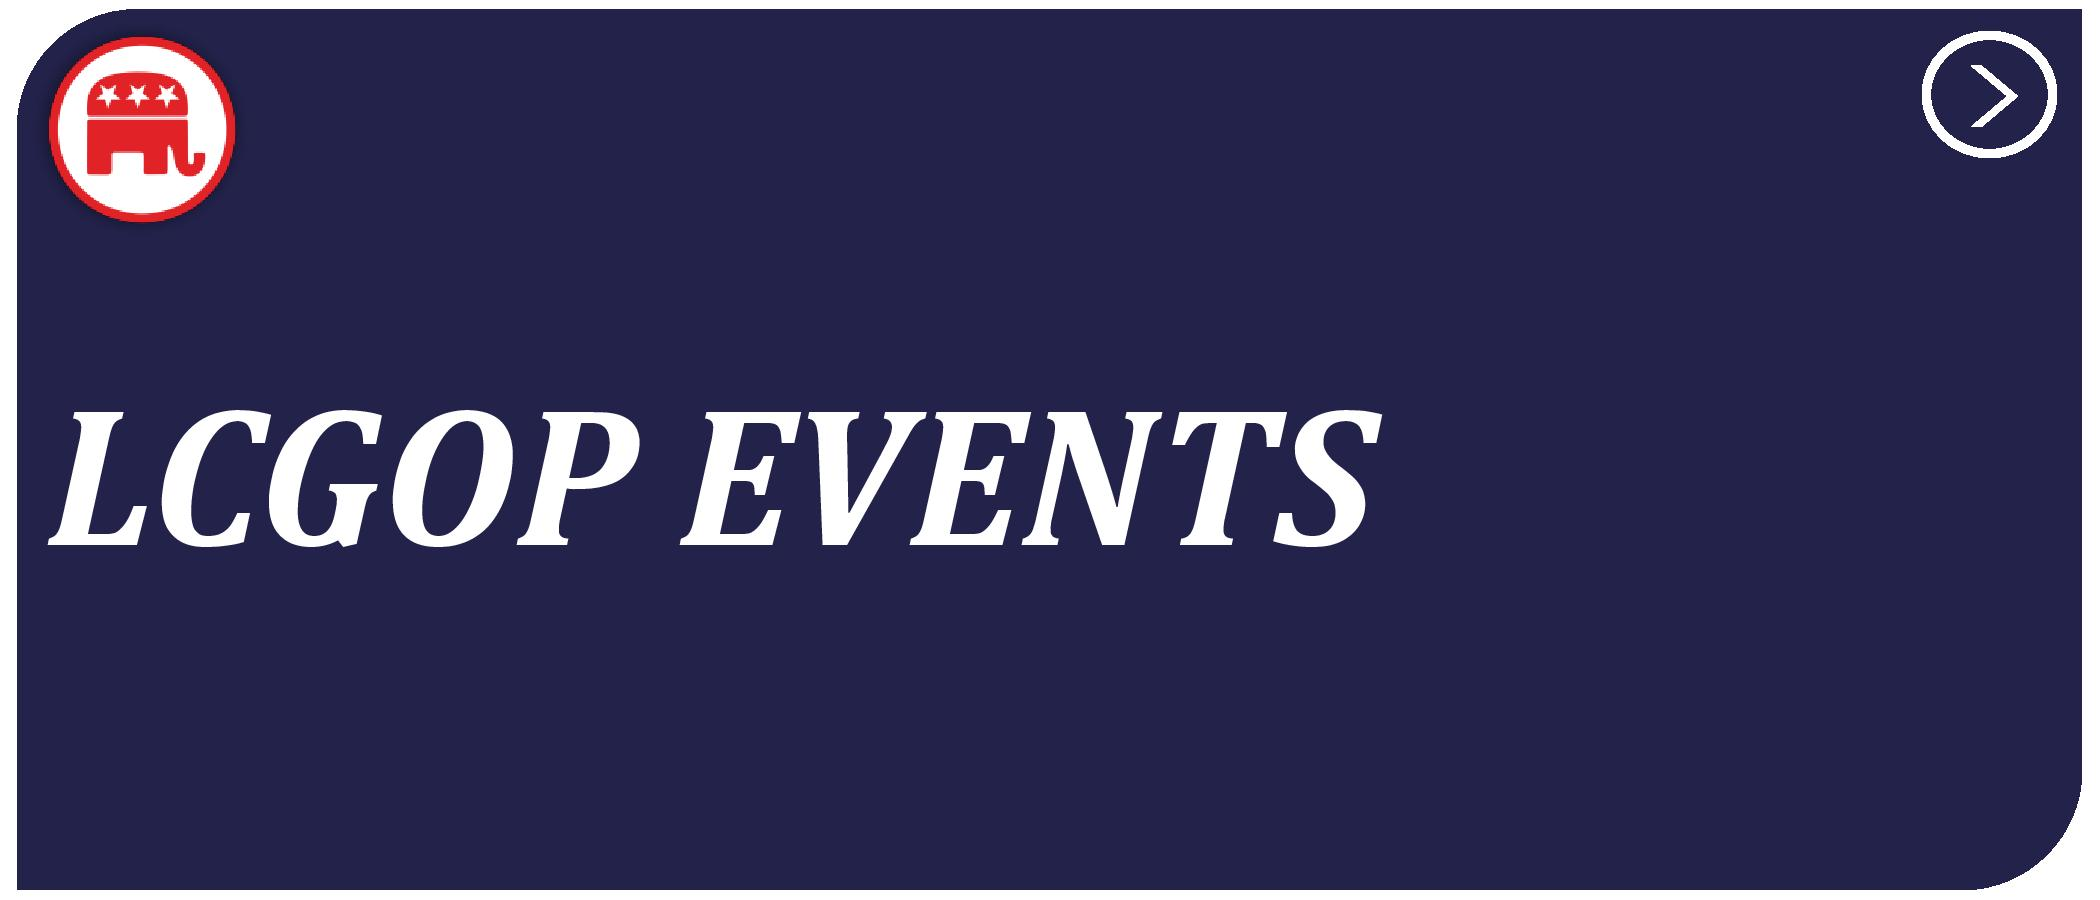 Social_Media_Events_for_Website_(2)-page-001.jpg